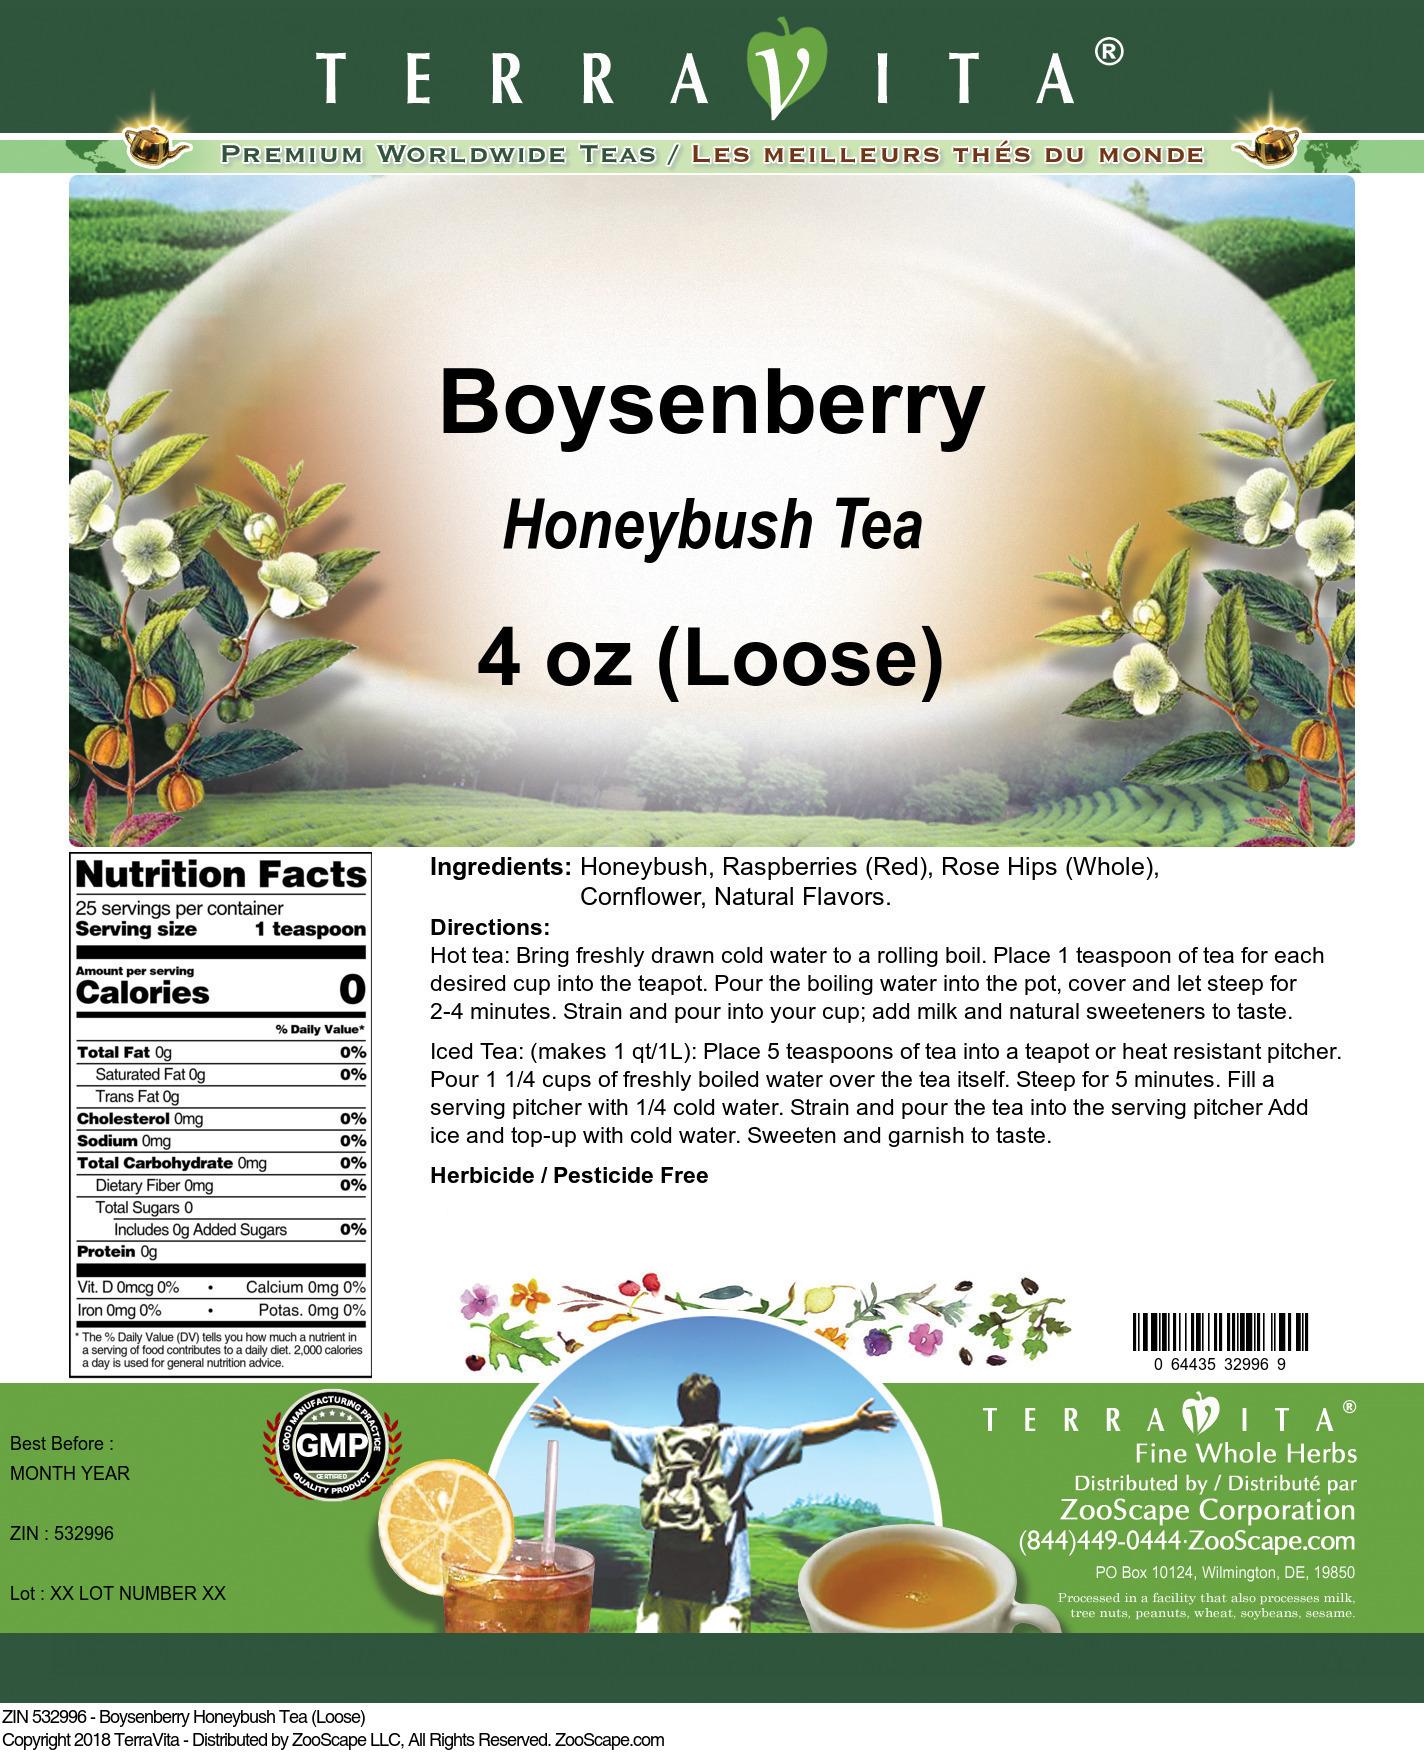 Boysenberry Honeybush Tea (Loose)